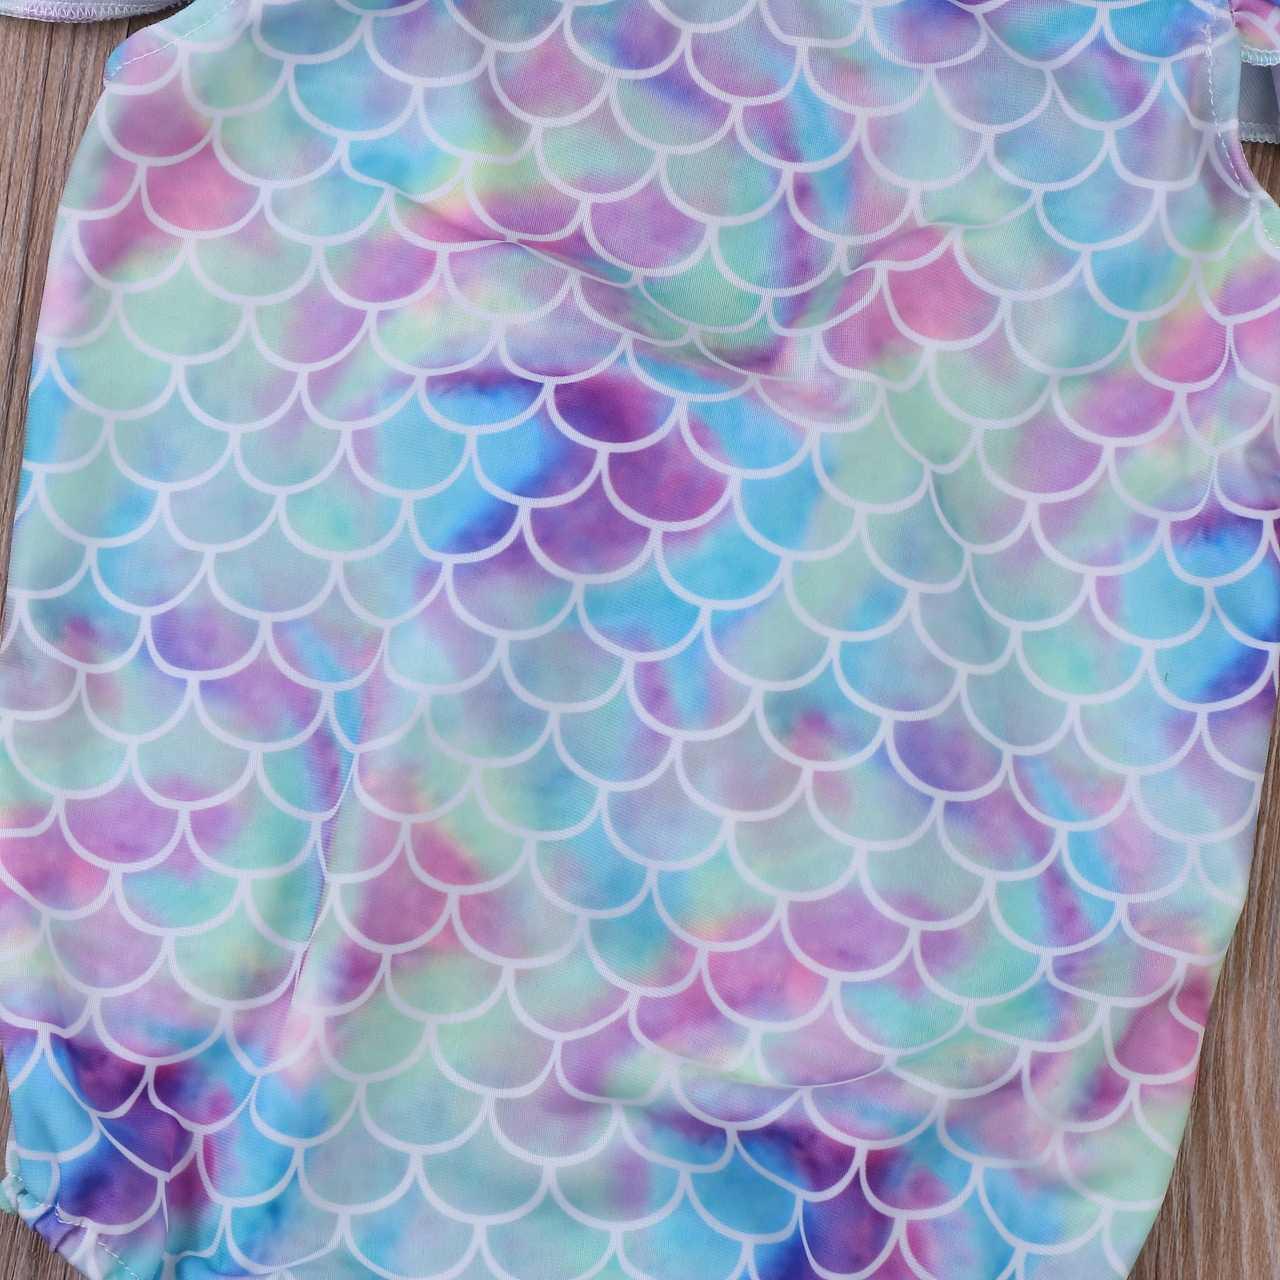 Lovely Balita Anak-anak Bayi Gadis Putri Duyung Renda Ikatan Simpul Tanpa Lengan Pakaian Renang Satu Potong Pakaian Renang Kolam Mandi Pakaian Renang